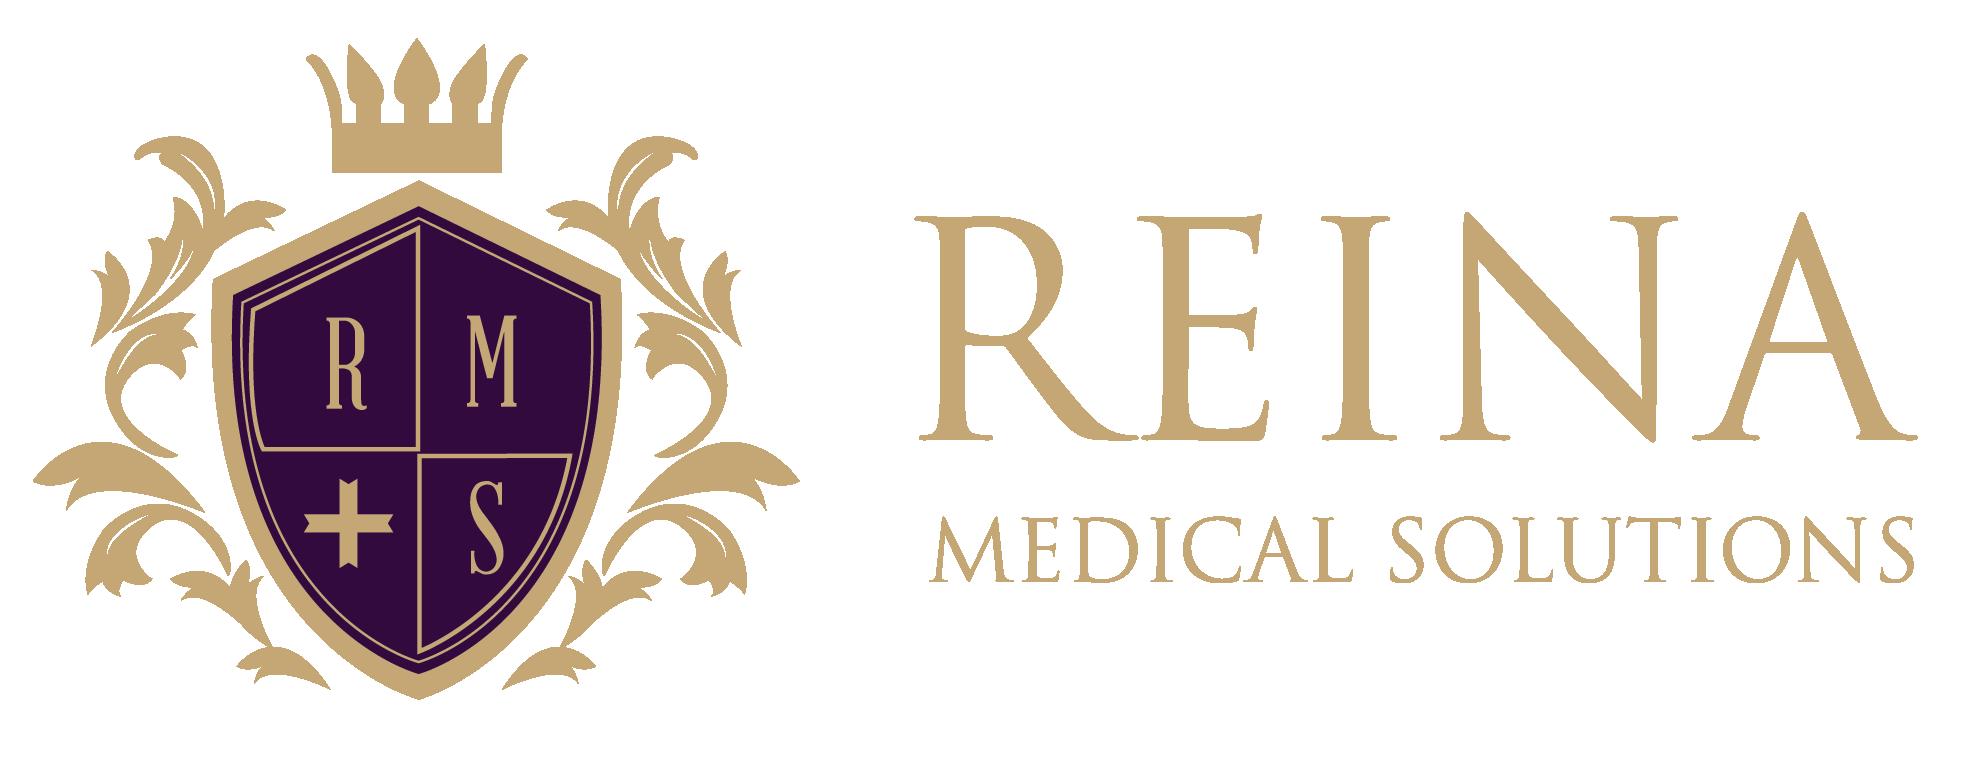 Reina medical solutions logo